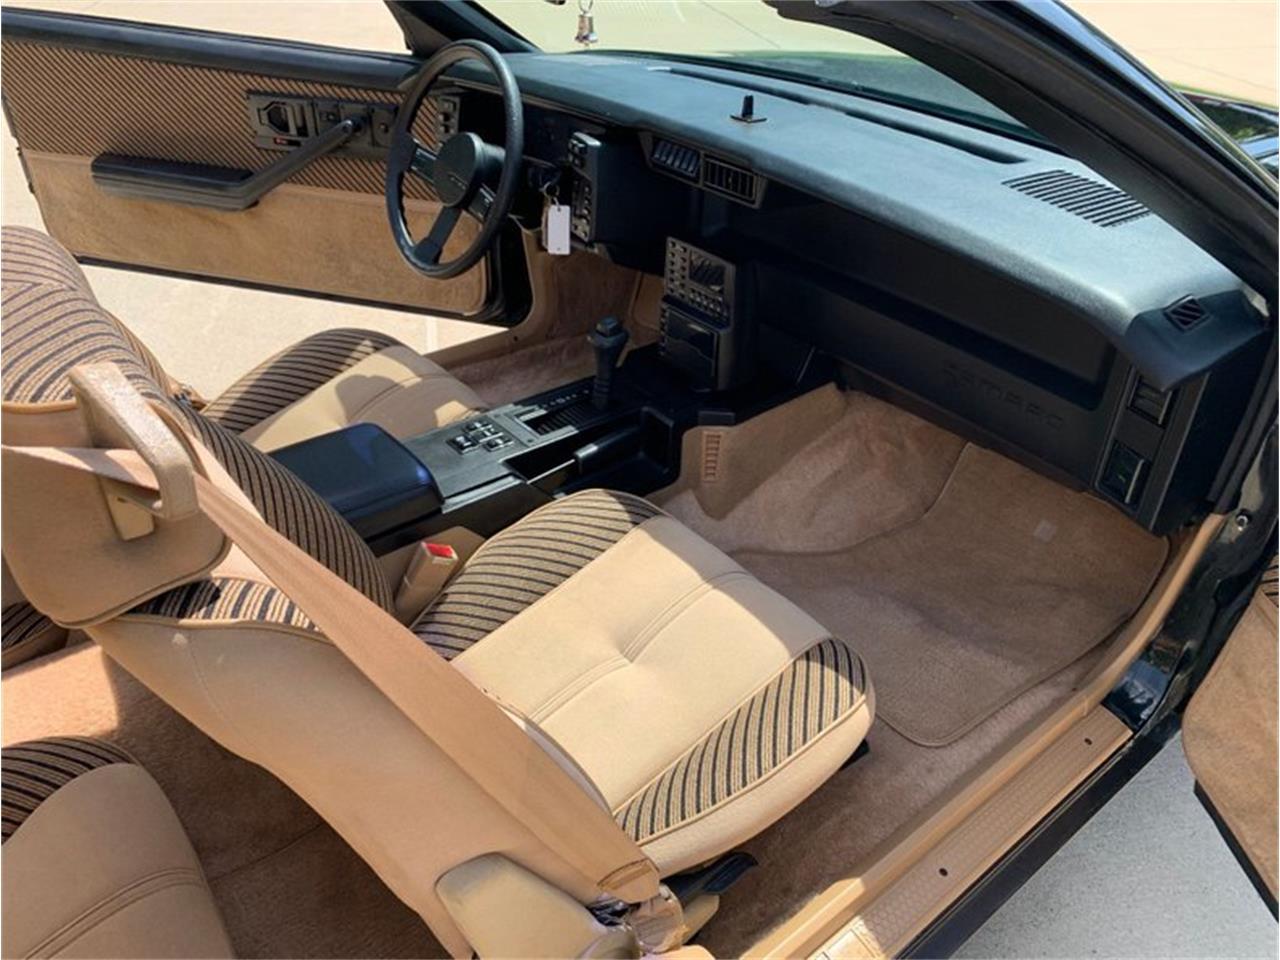 1984 Chevrolet Camaro (CC-1415786) for sale in Punta Gorda, Florida